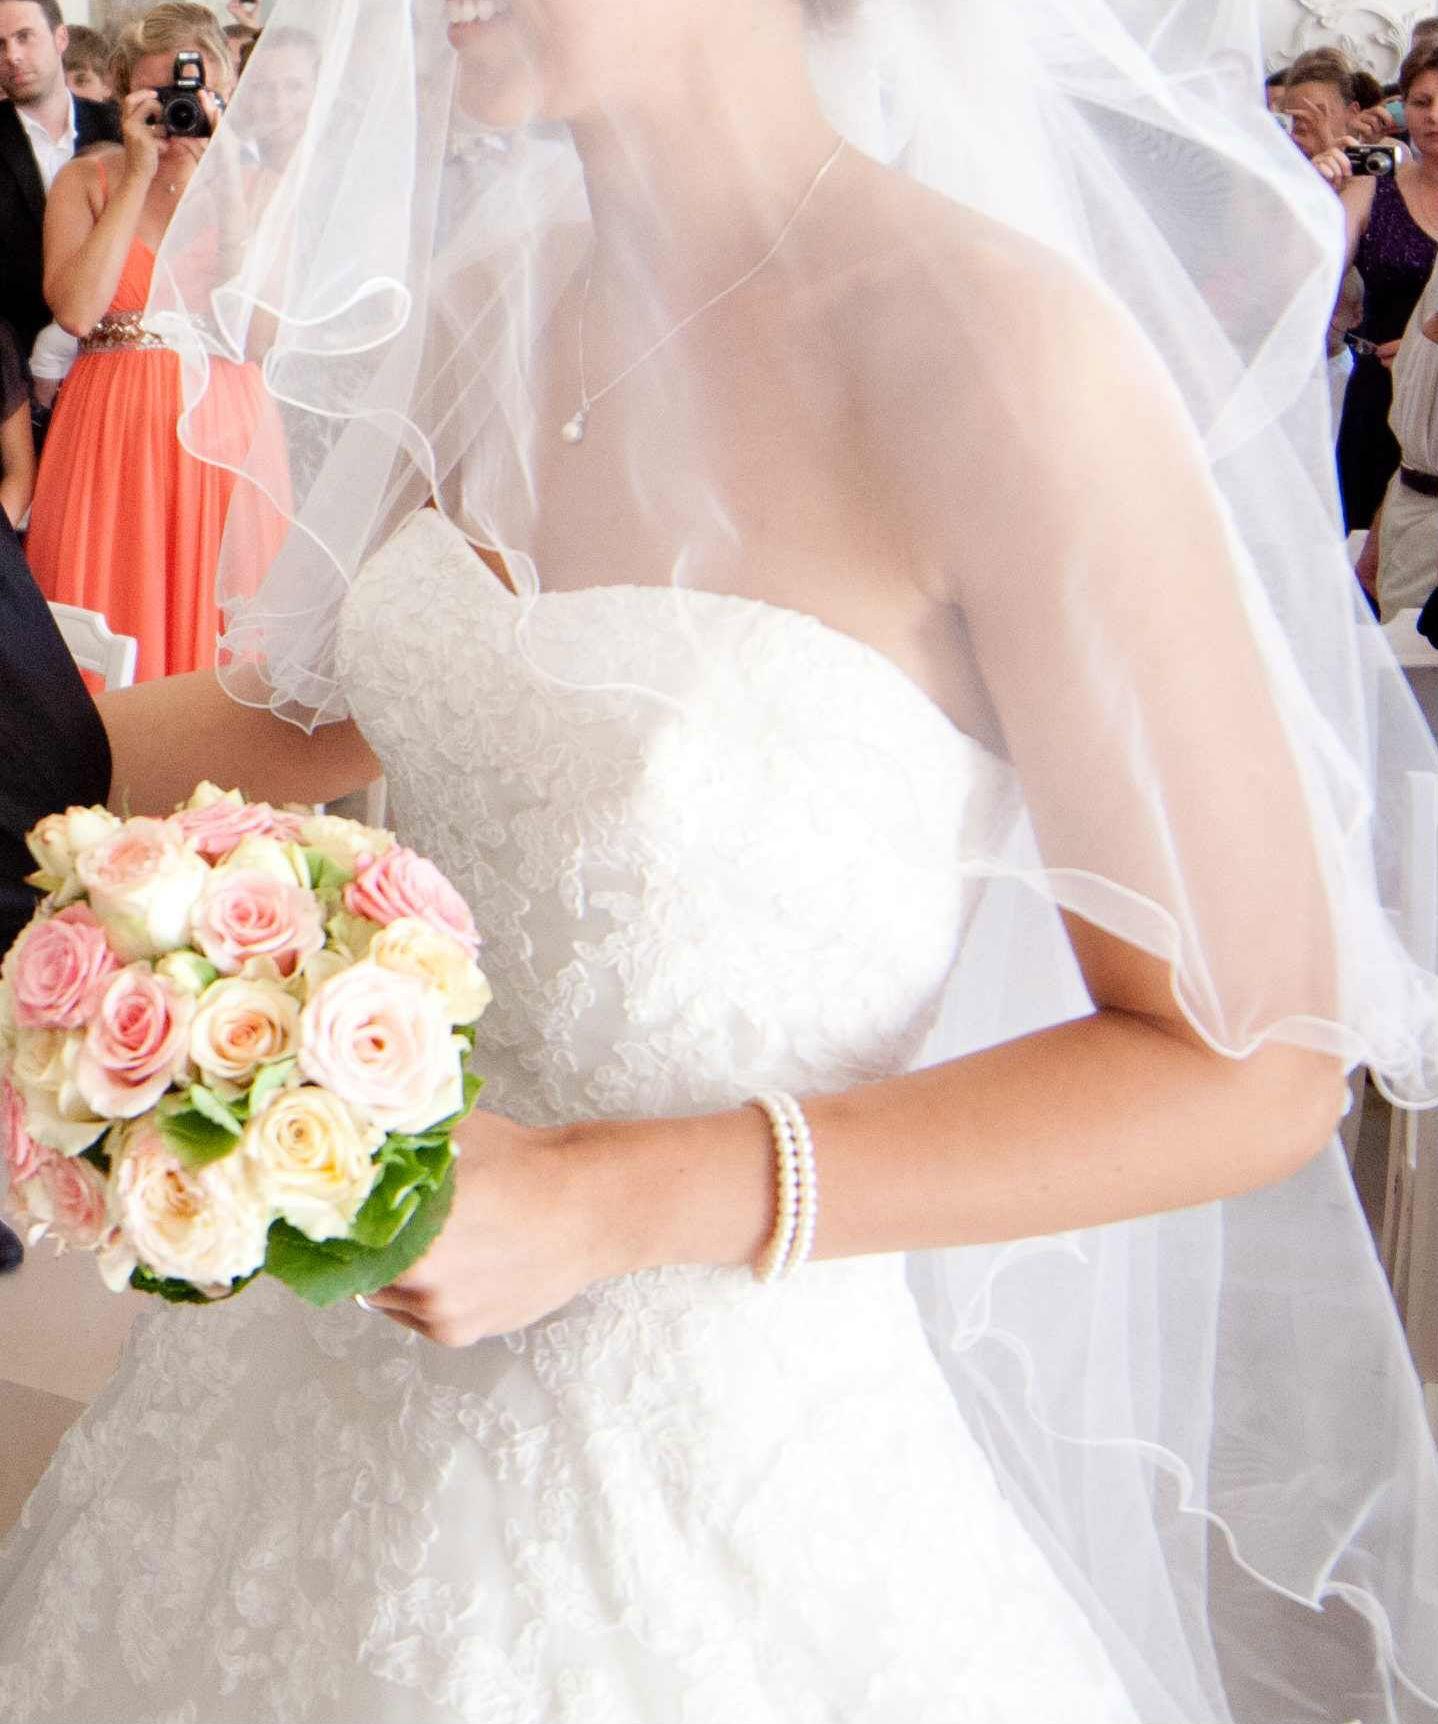 Pronovias Brautkleid   Wedding   Hochzeit   Pinterest   Pronovias ...